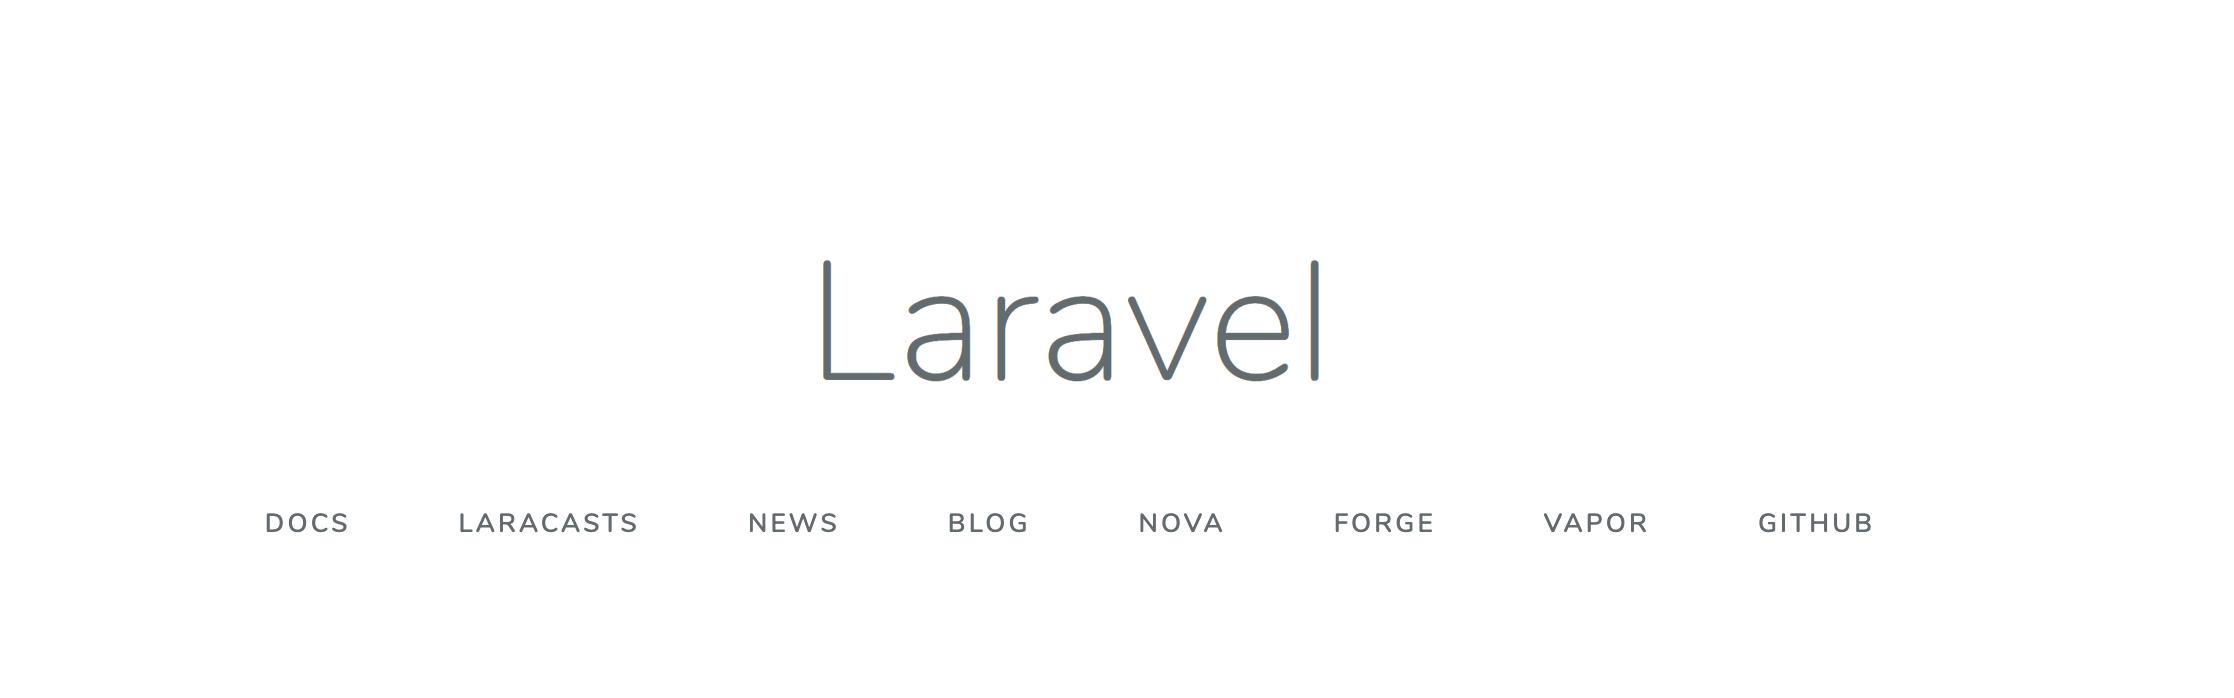 LaravelをDockerで動かすときの手順【コマンドを順番に実行するだけ】